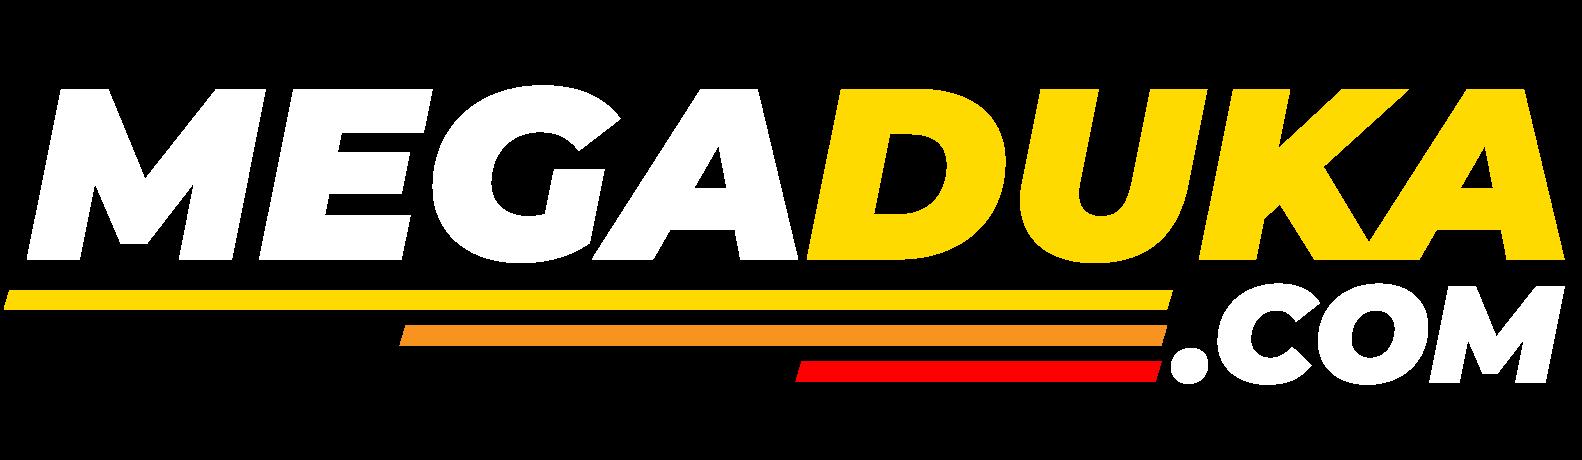 Megaduka logo